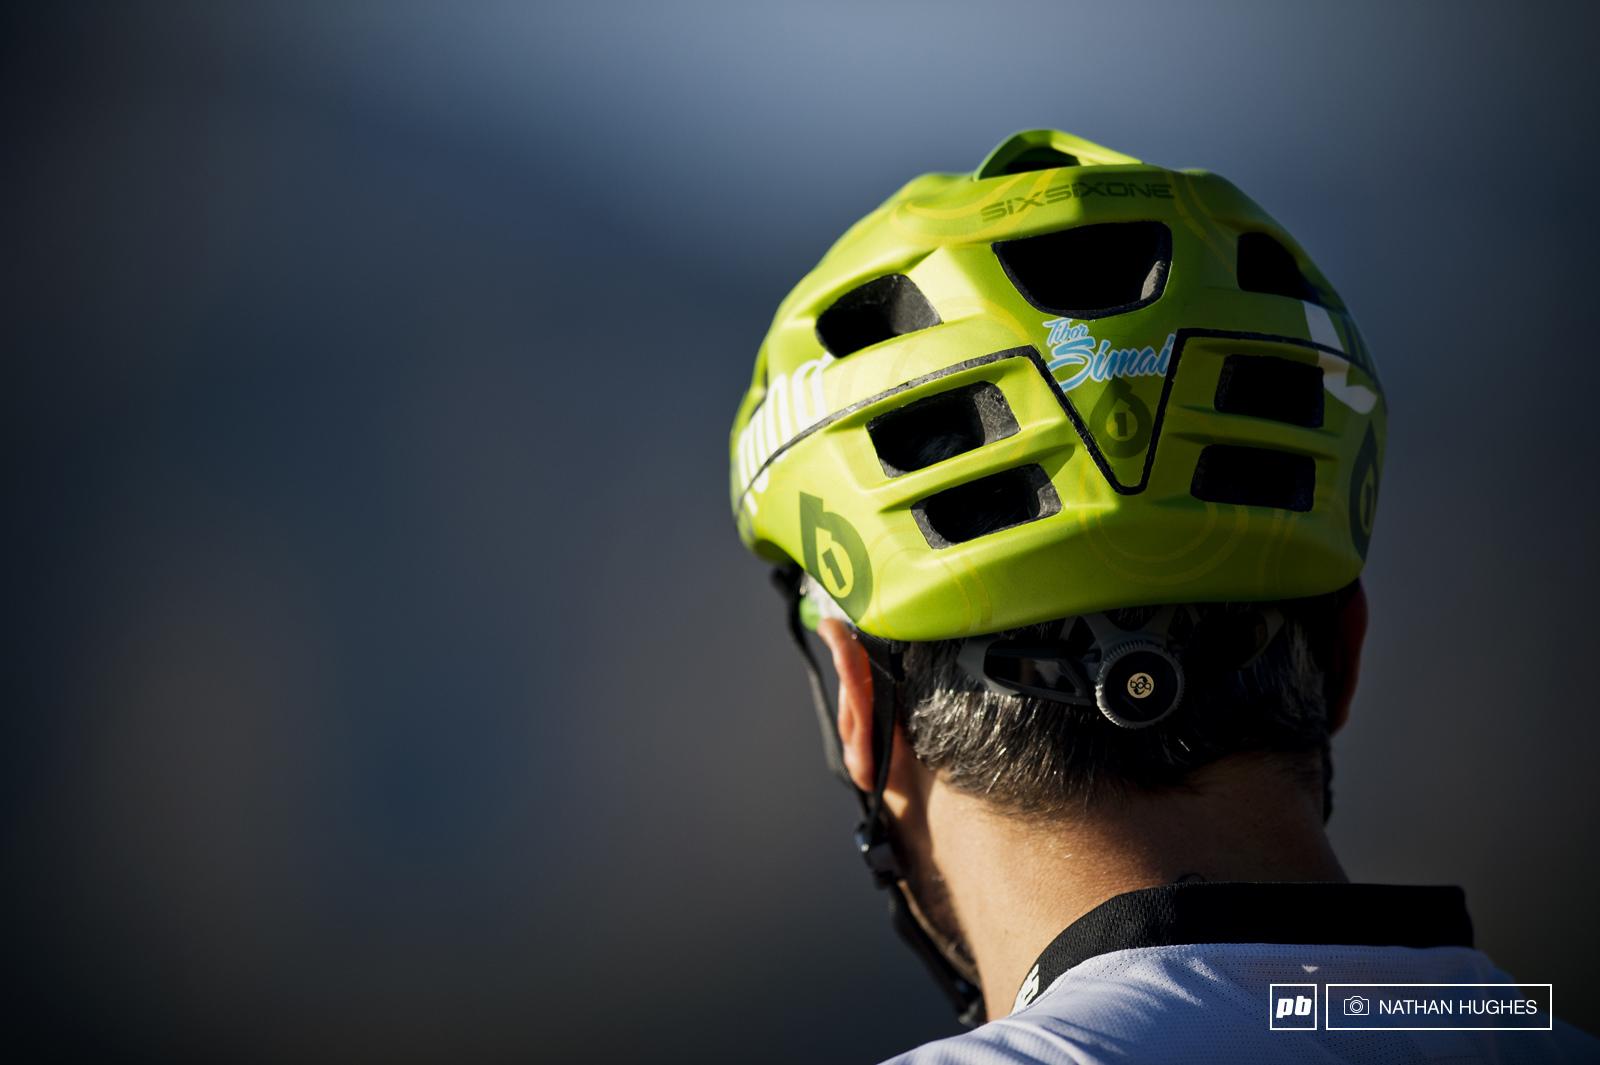 Tibor helmet